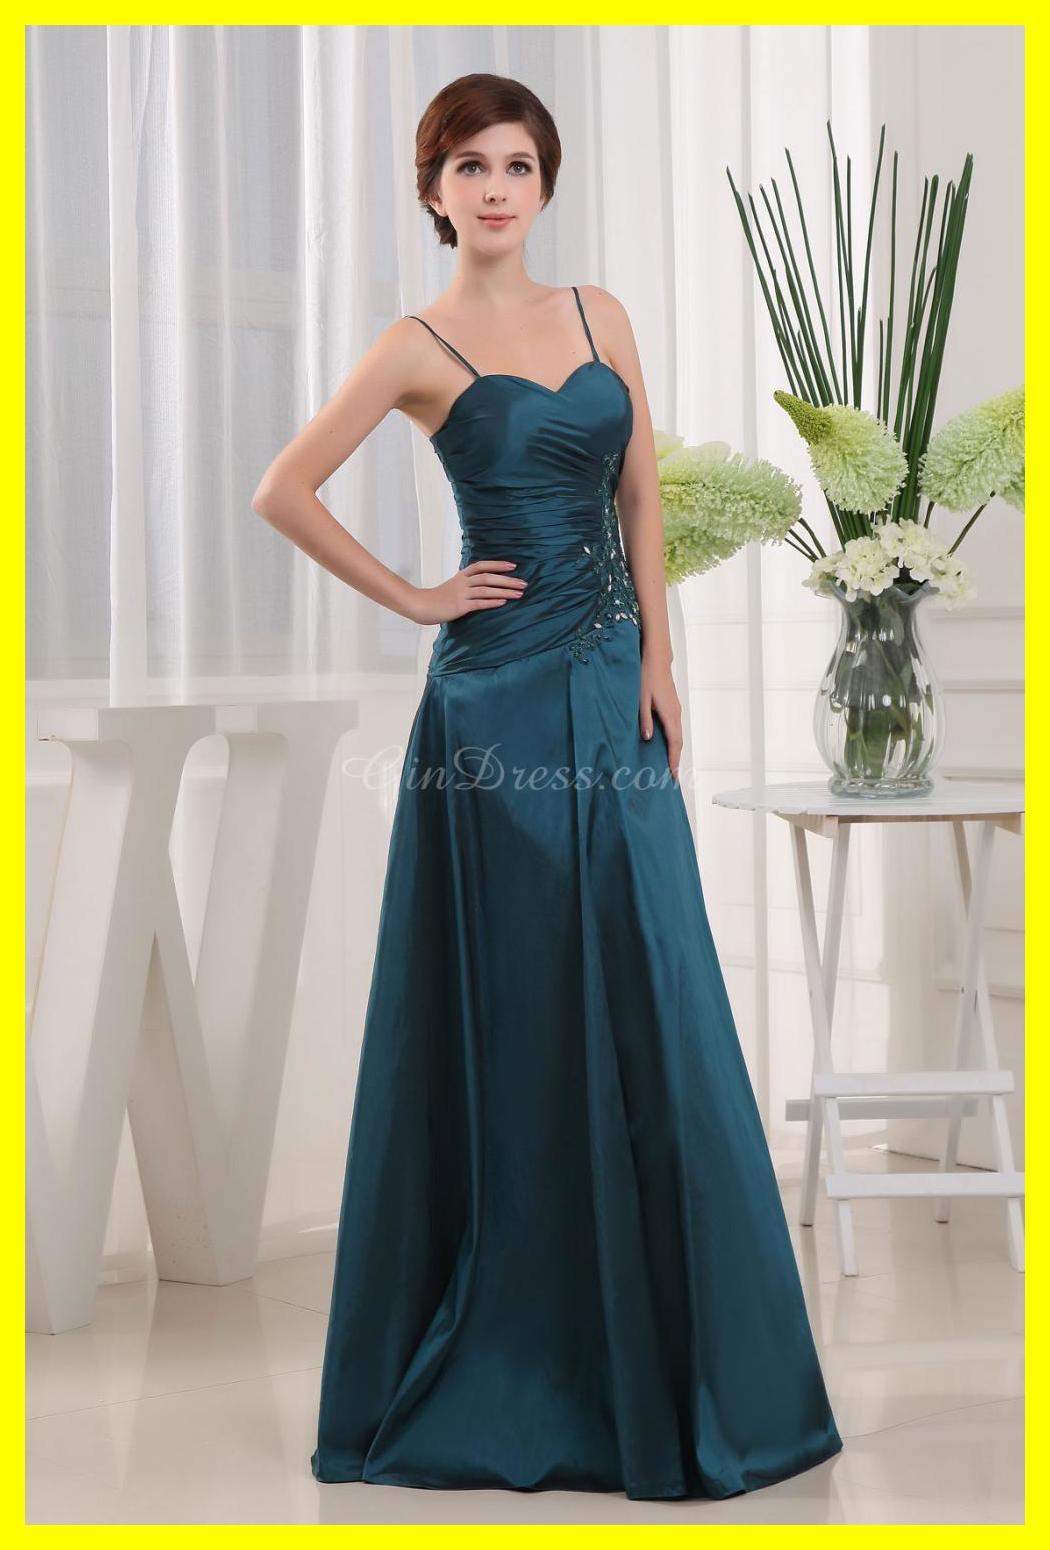 Black And Ivory Bridesmaid Dresses Uk - Flower Girl Dresses